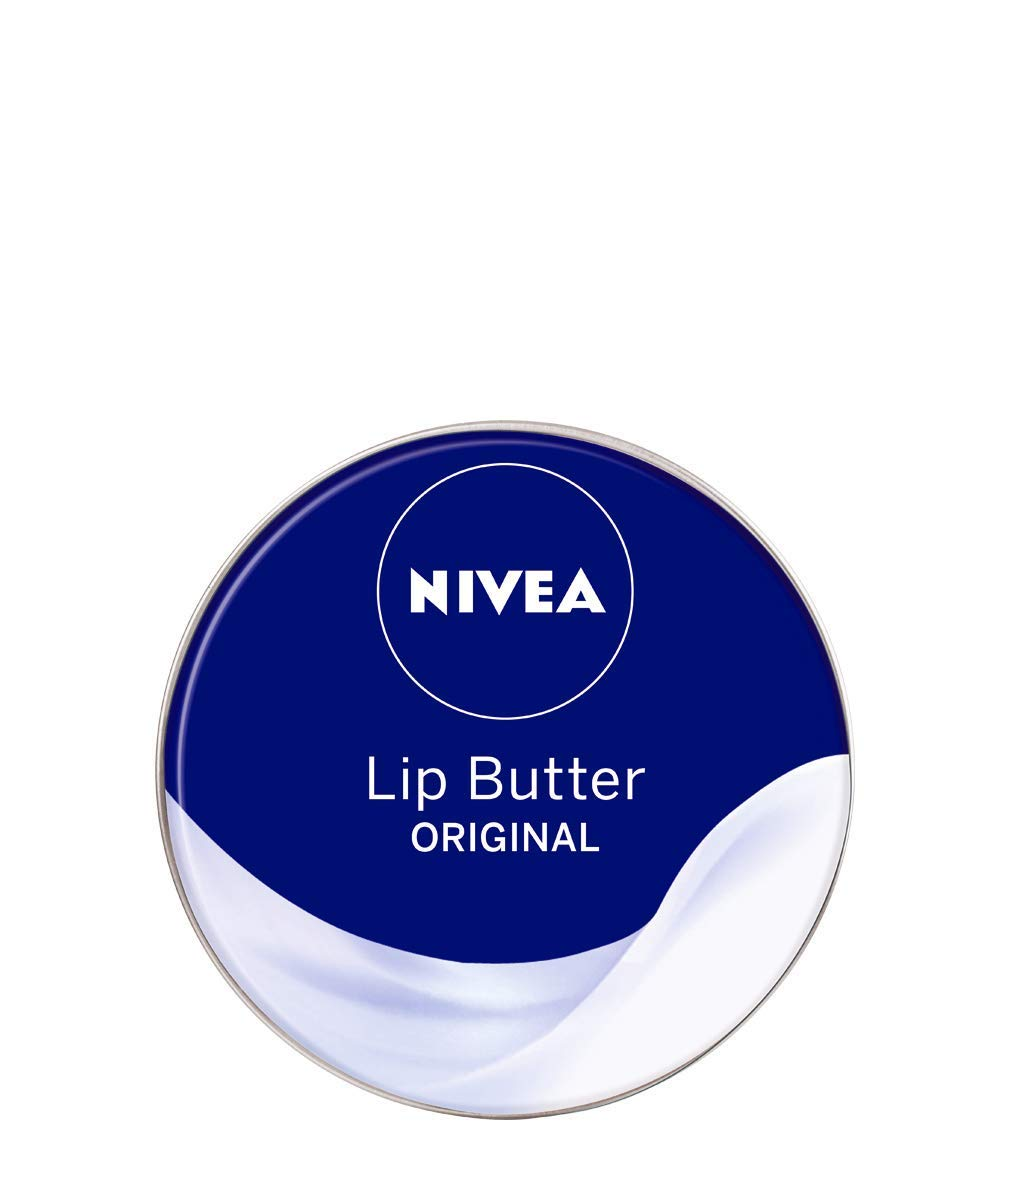 Nivea Lip Butter Original - 19 ml, Pack of 6 by Nivea